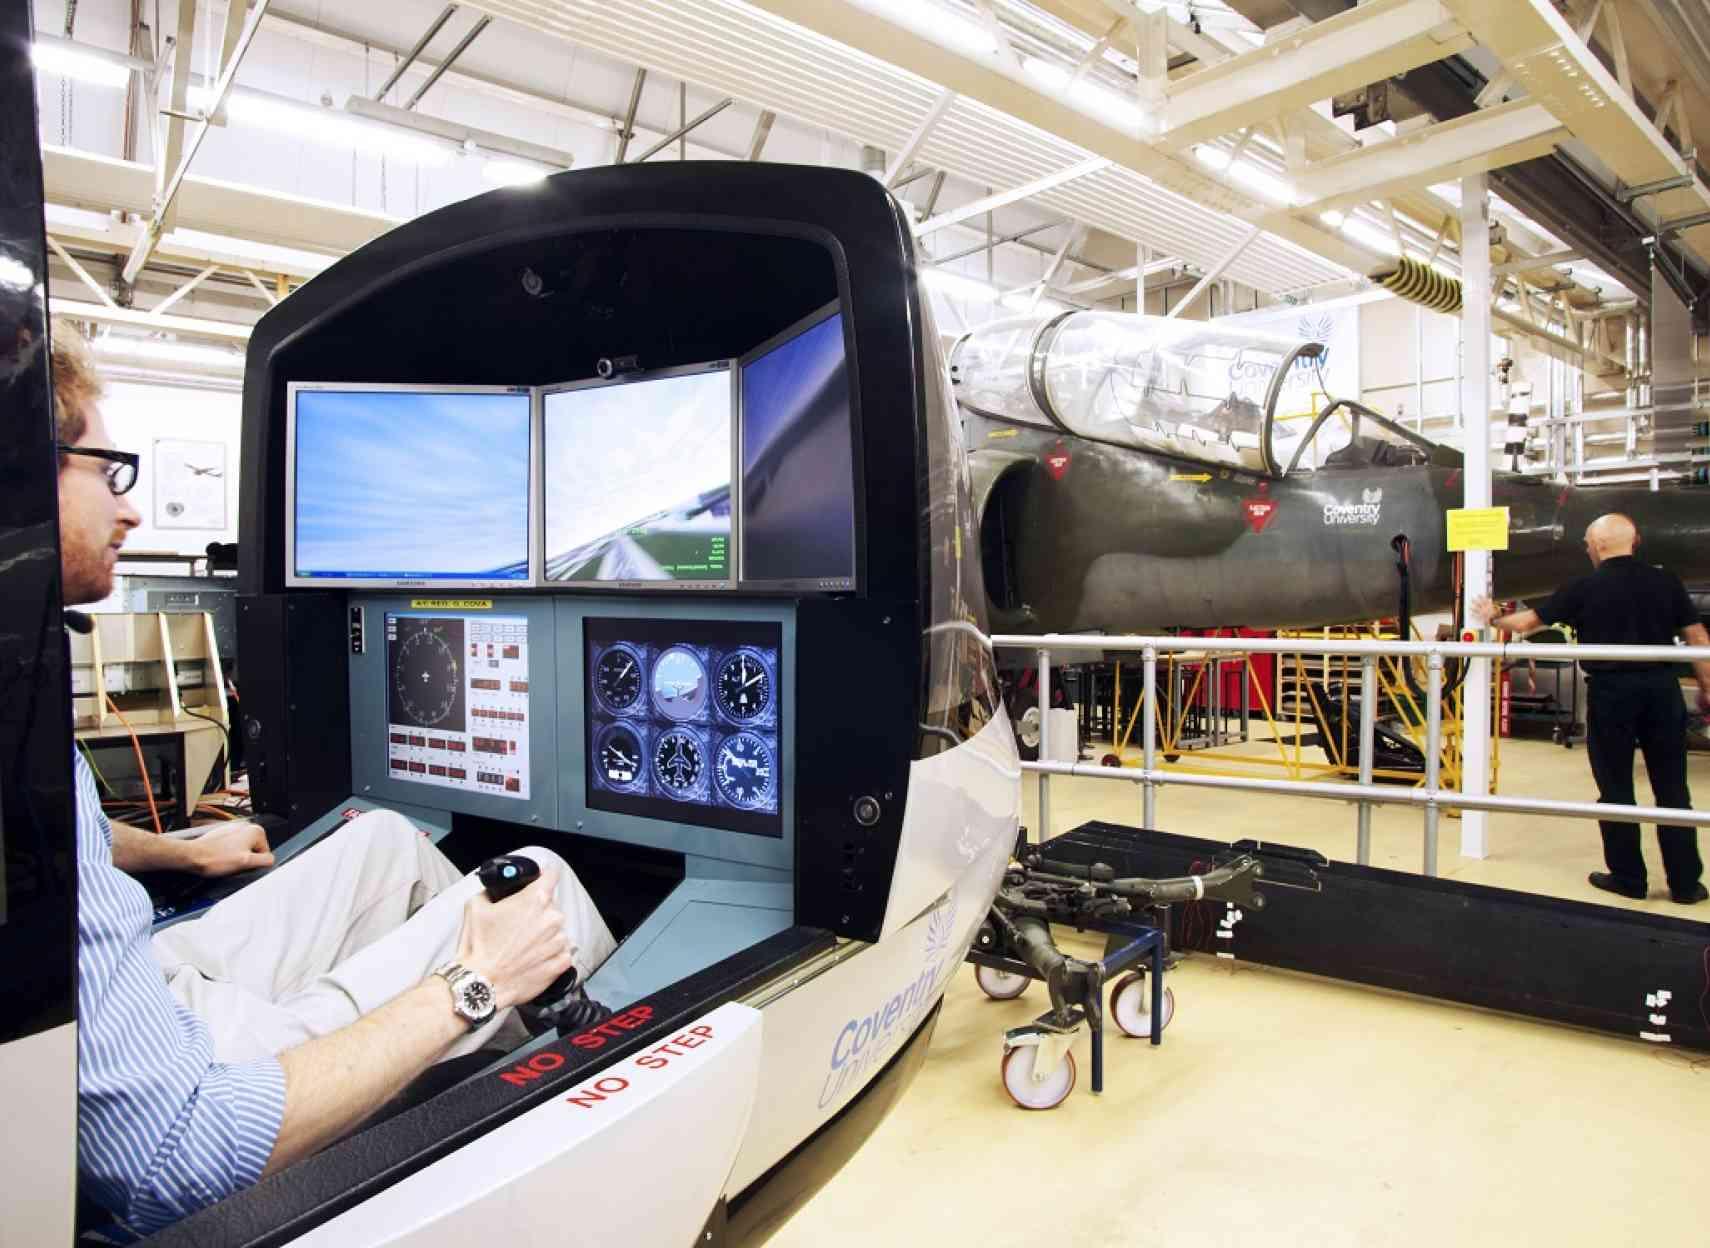 Flight simulator at Coventry University